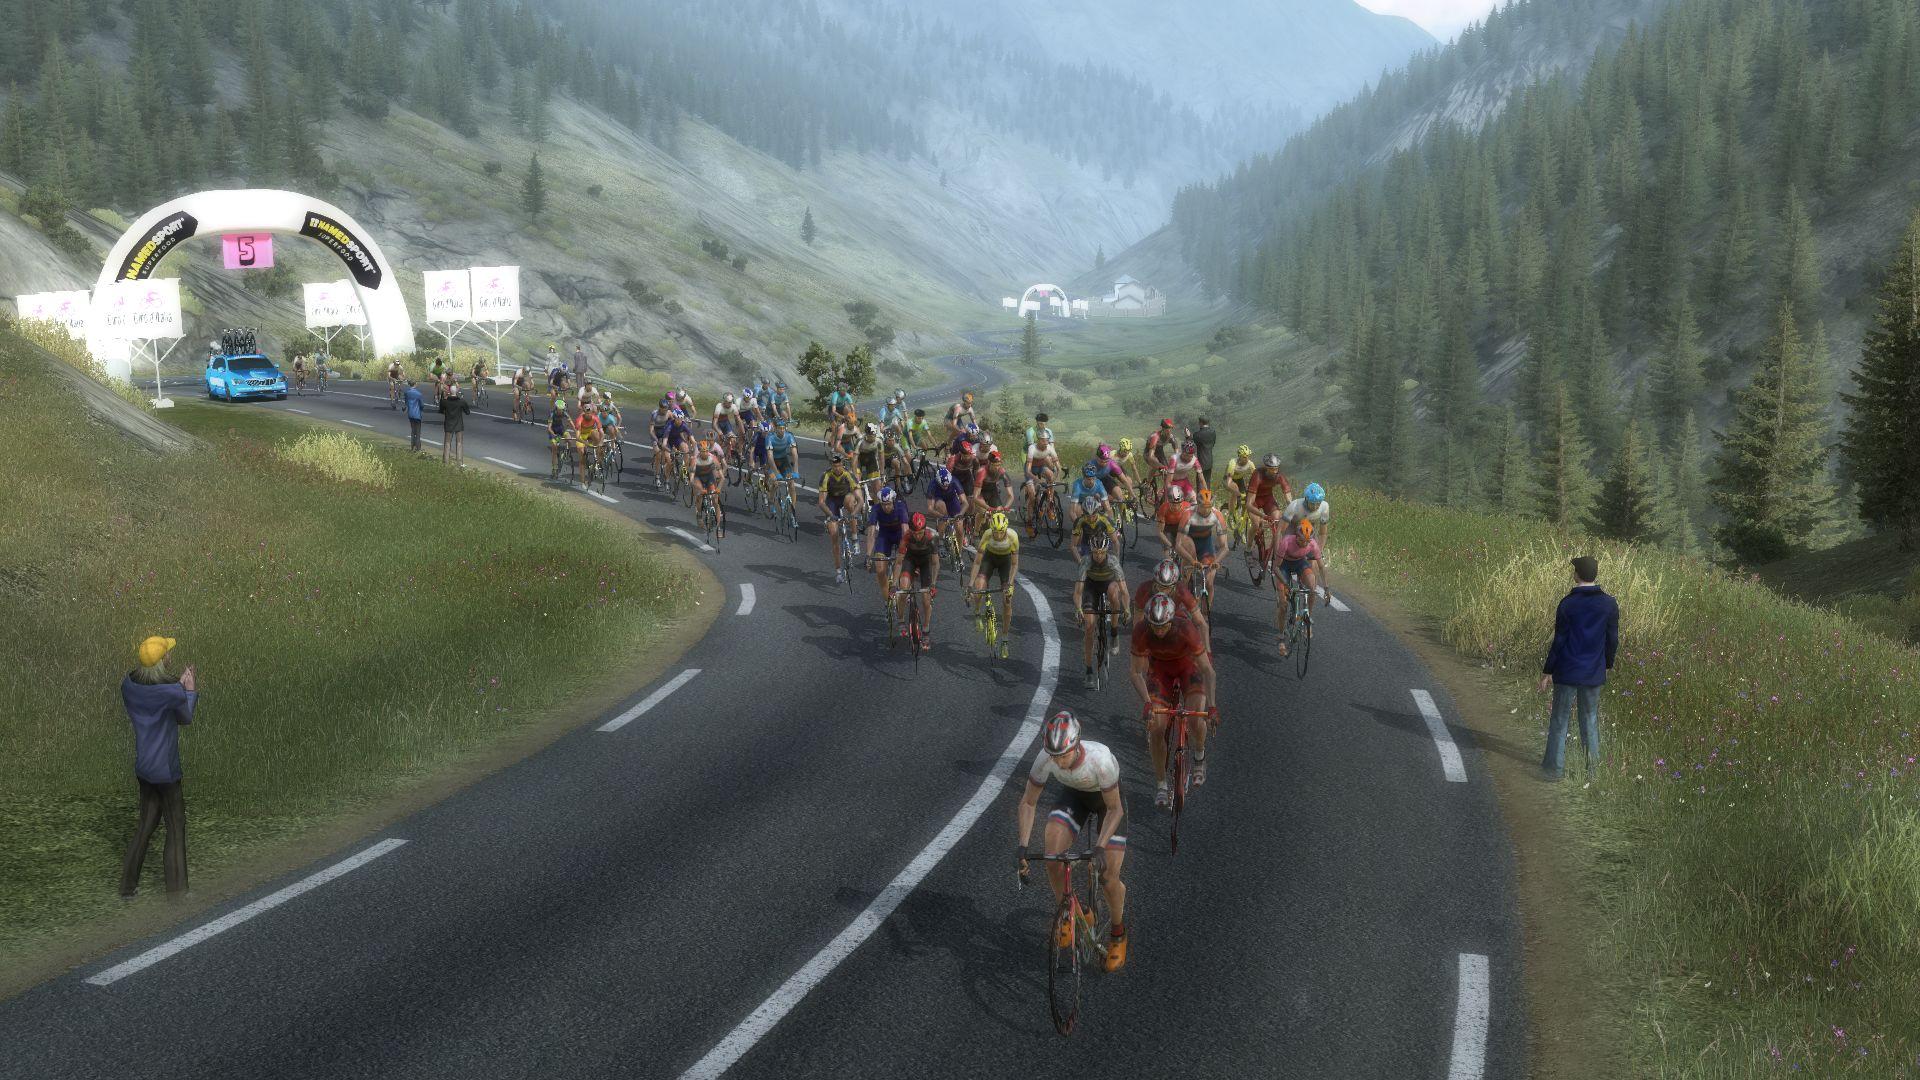 pcmdaily.com/images/mg/2020/Reports/GTM/Giro/S20/mg20_giro_s20_072.jpg